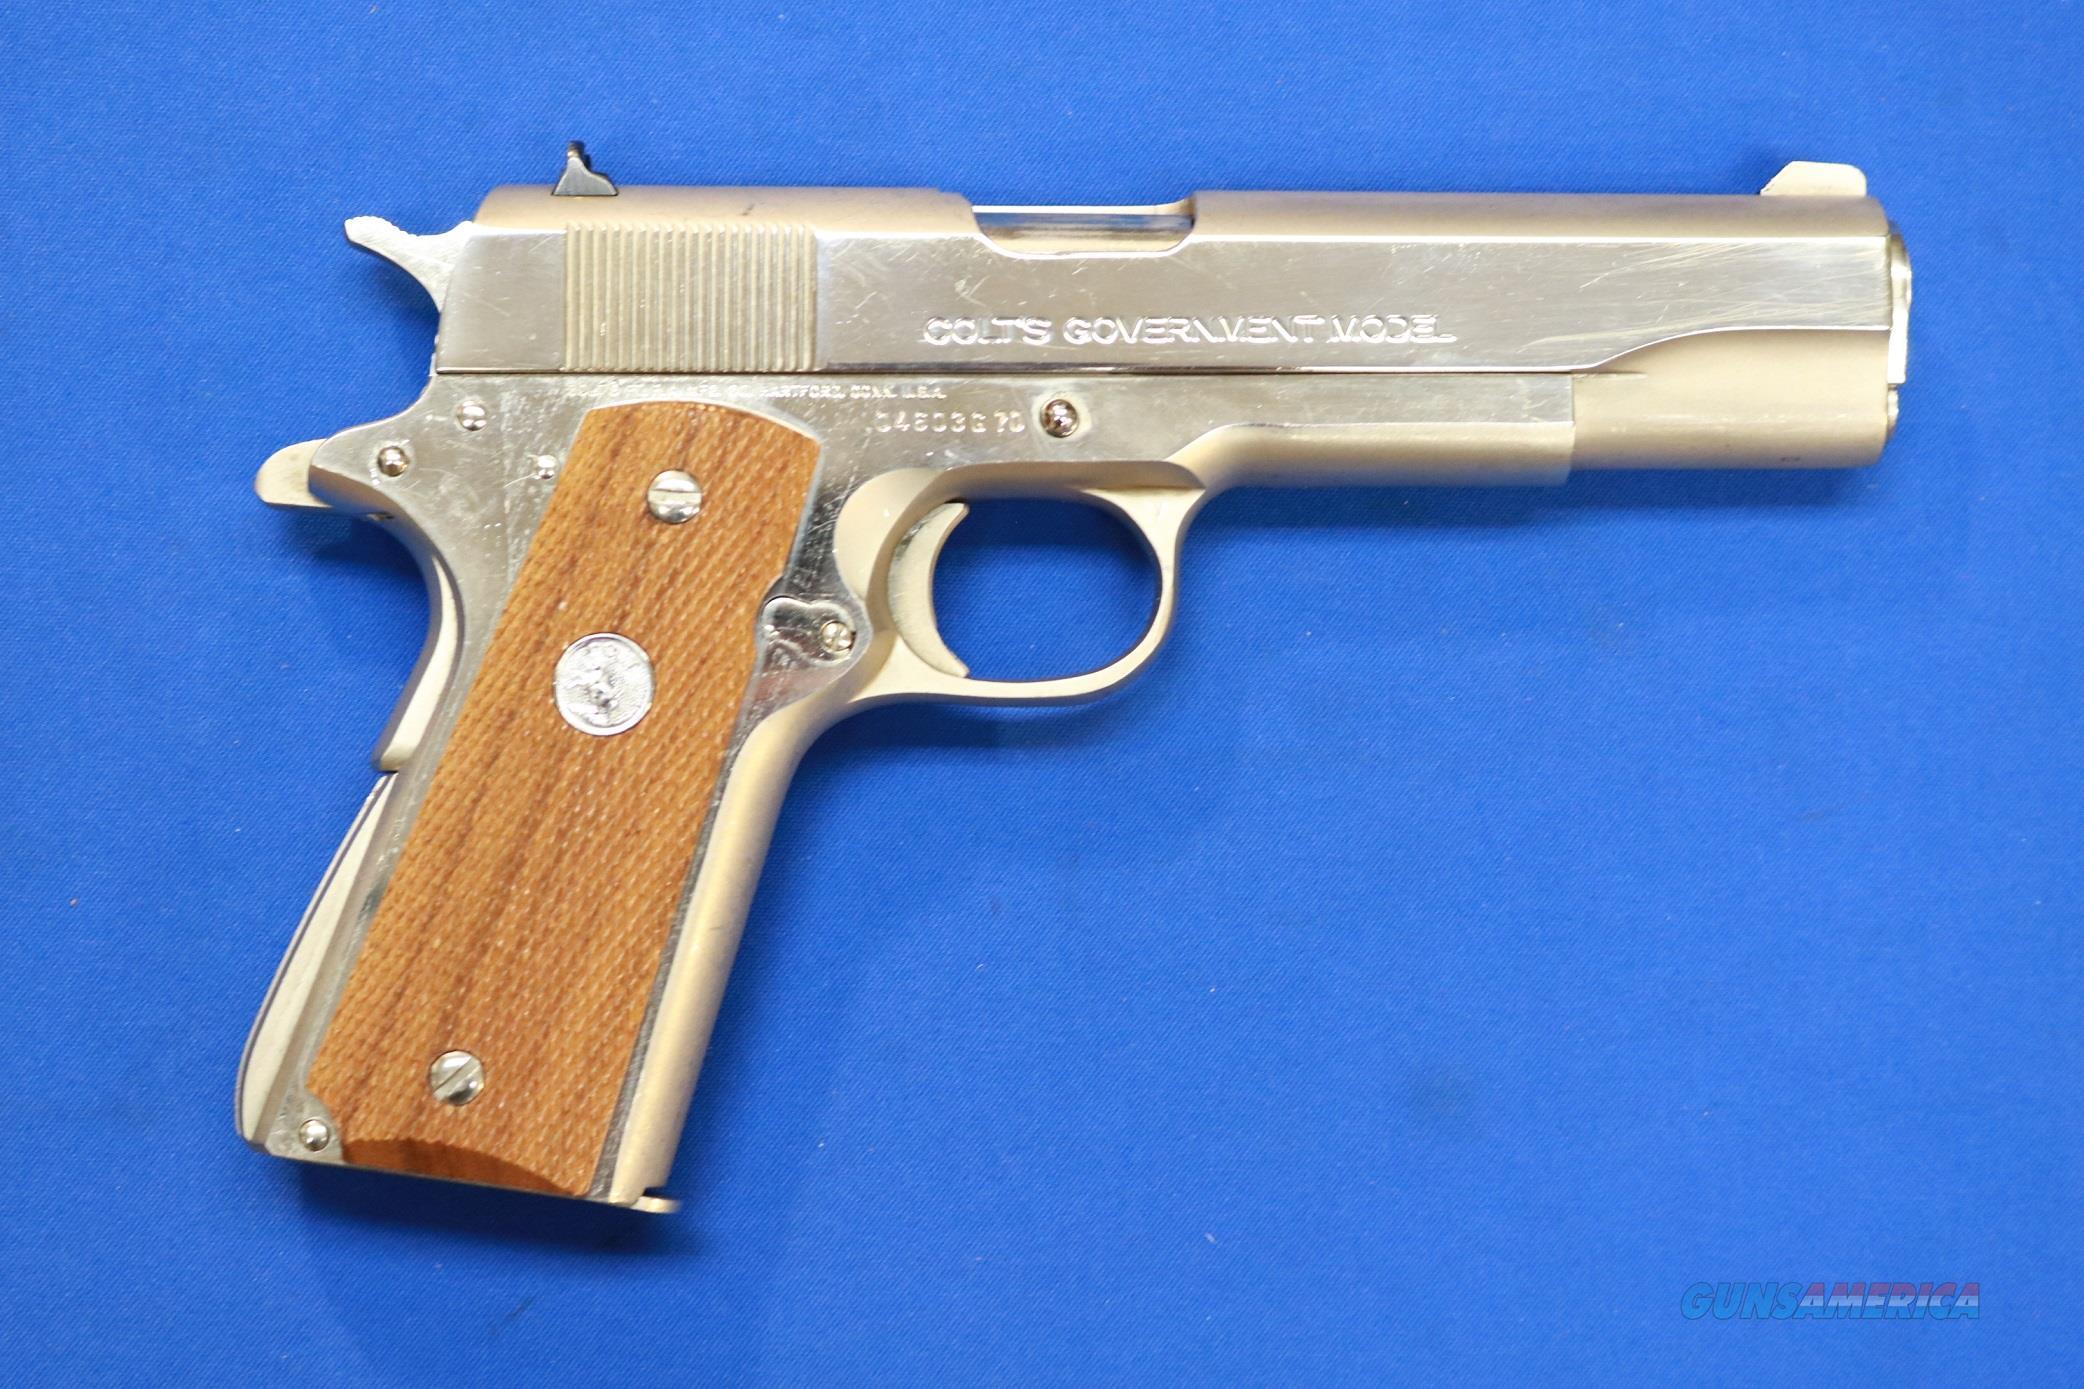 COLT Mk IV SERIES 70 GOVERNMENT .45 ACP NICKEL 1976  Guns > Pistols > Colt Automatic Pistols (1911 & Var)